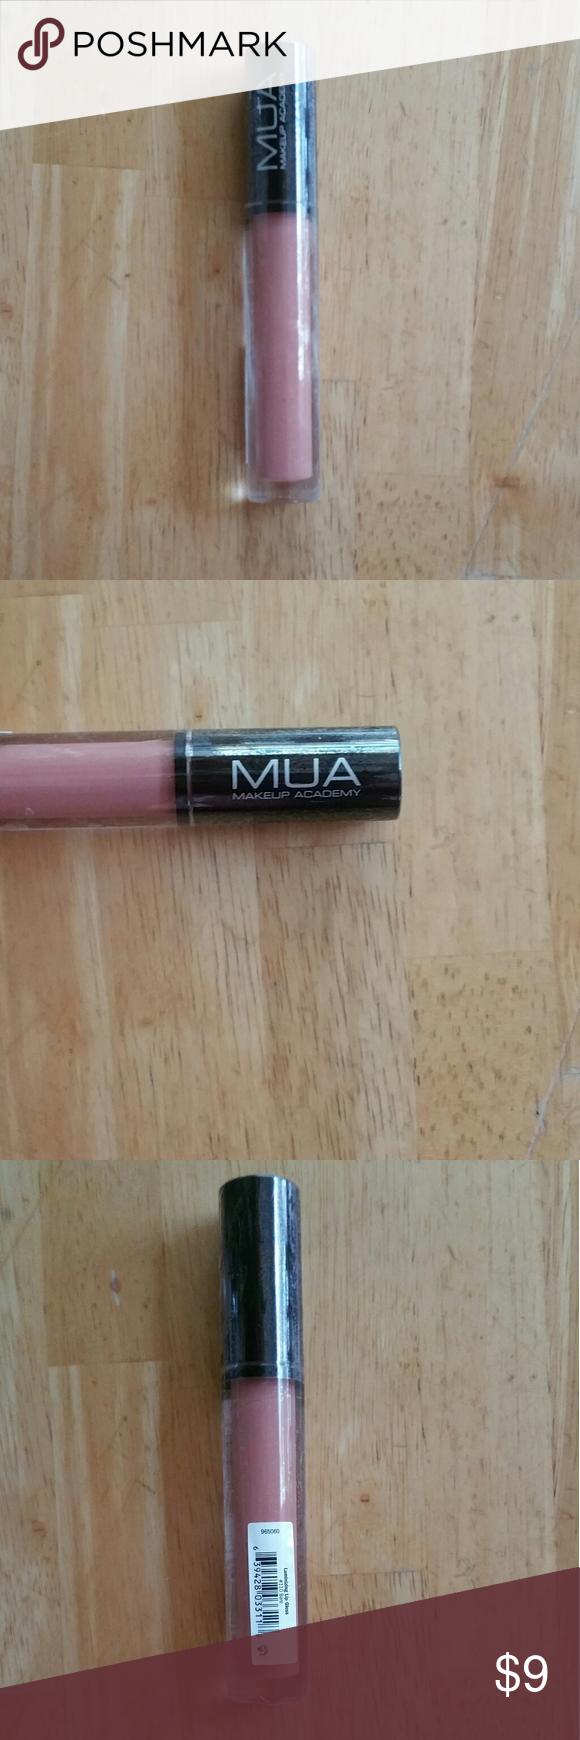 Makeup Academy (MUA) Luminizing Lip Gloss Bare NEW NWT in